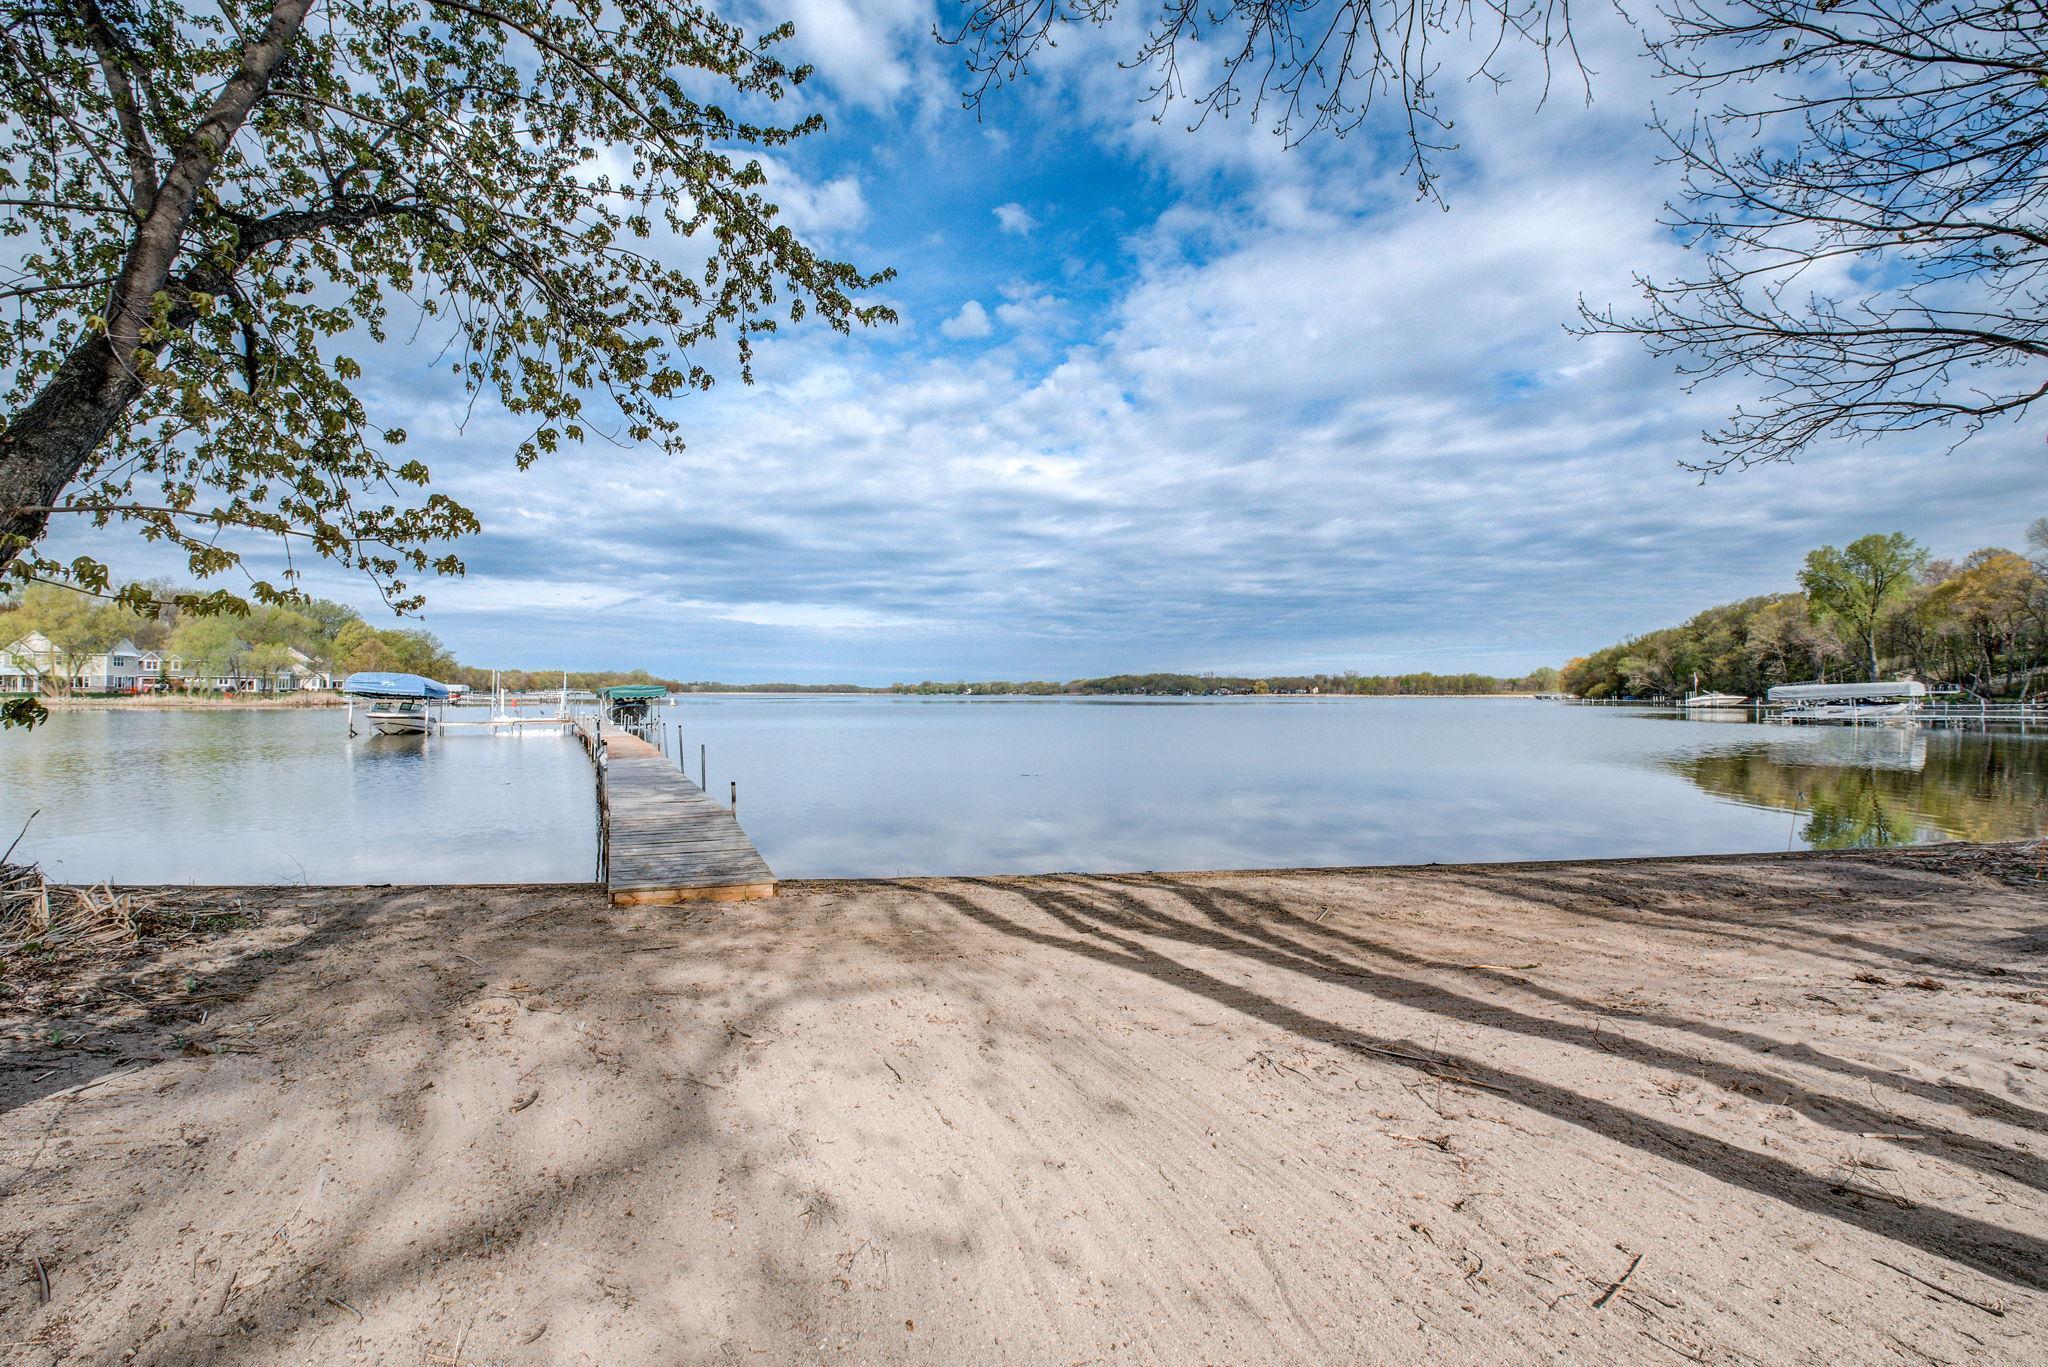 6280 Lake Sarah Heights Drive, Greenfield MN 55373 - Photo 2